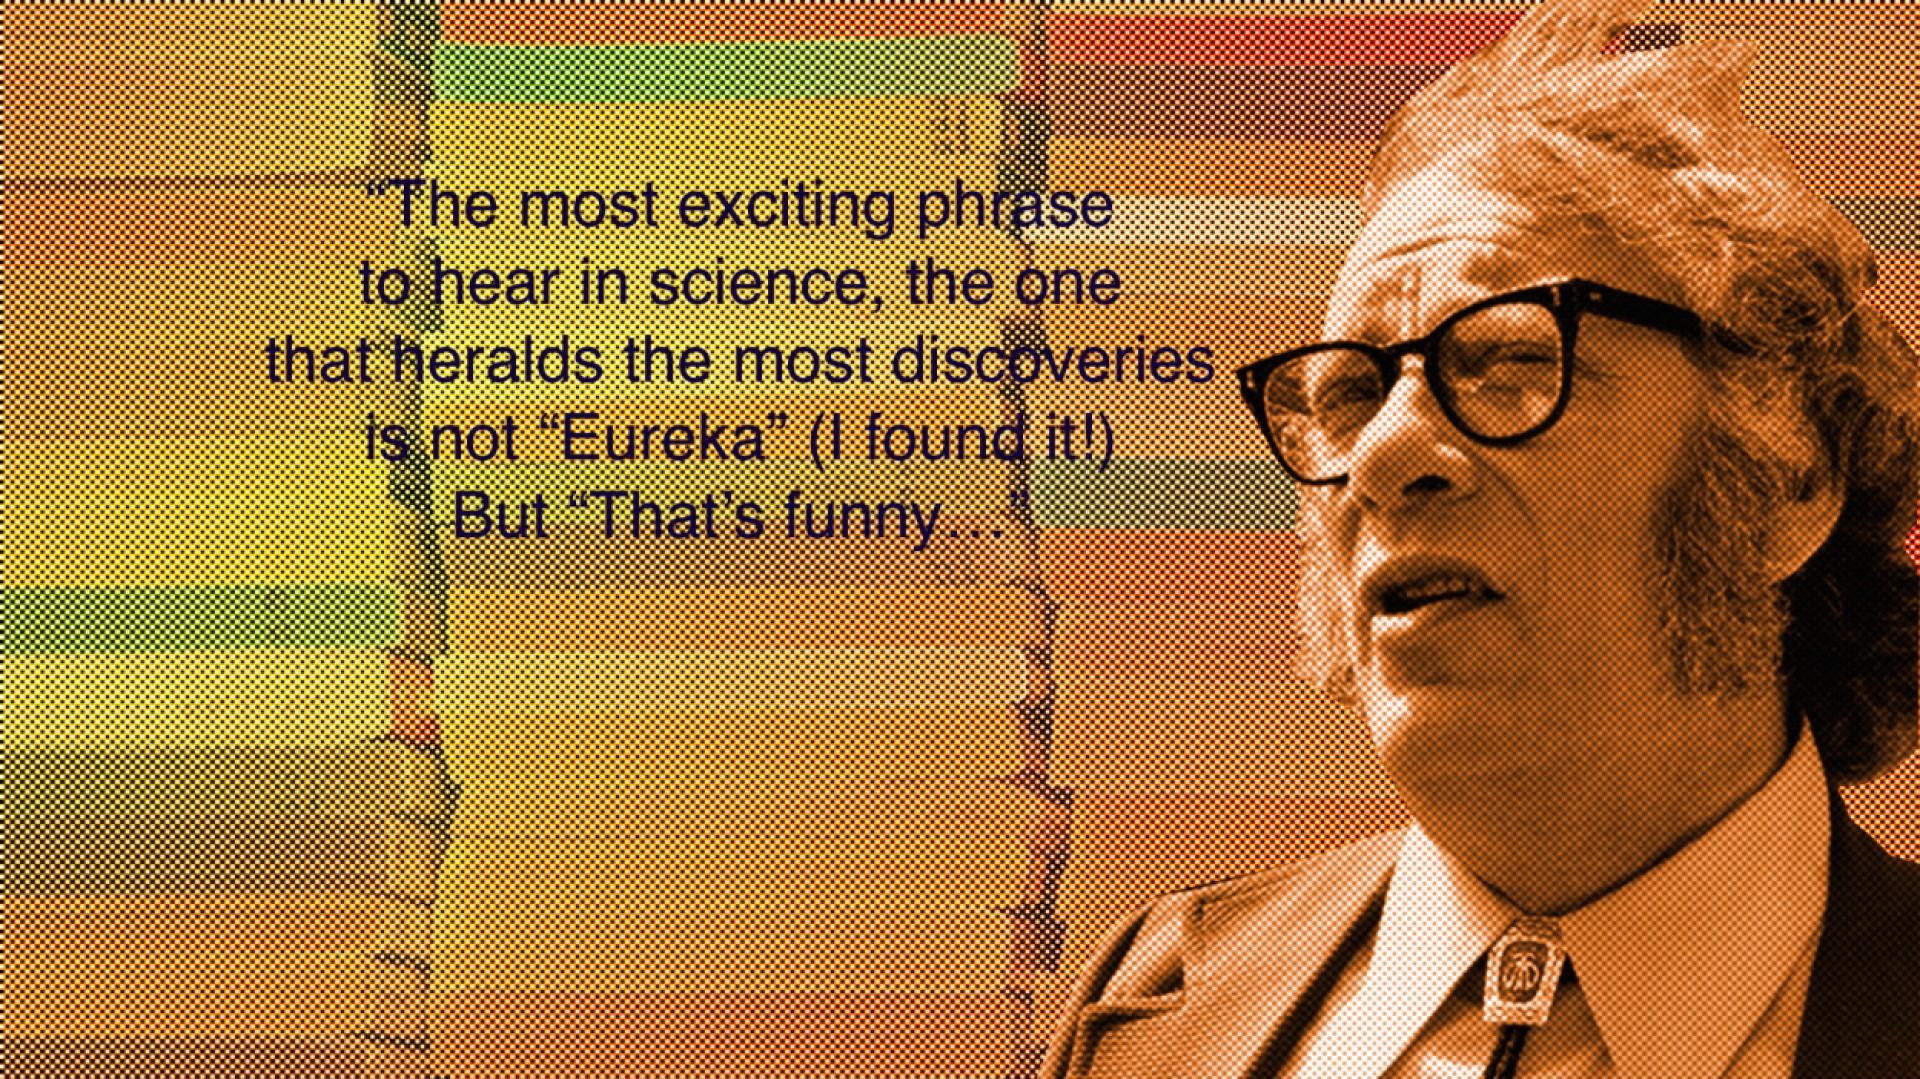 004 Isaac Asimov2w1250 Asimov Essays Essay Awful On Creativity Intelligence 1920